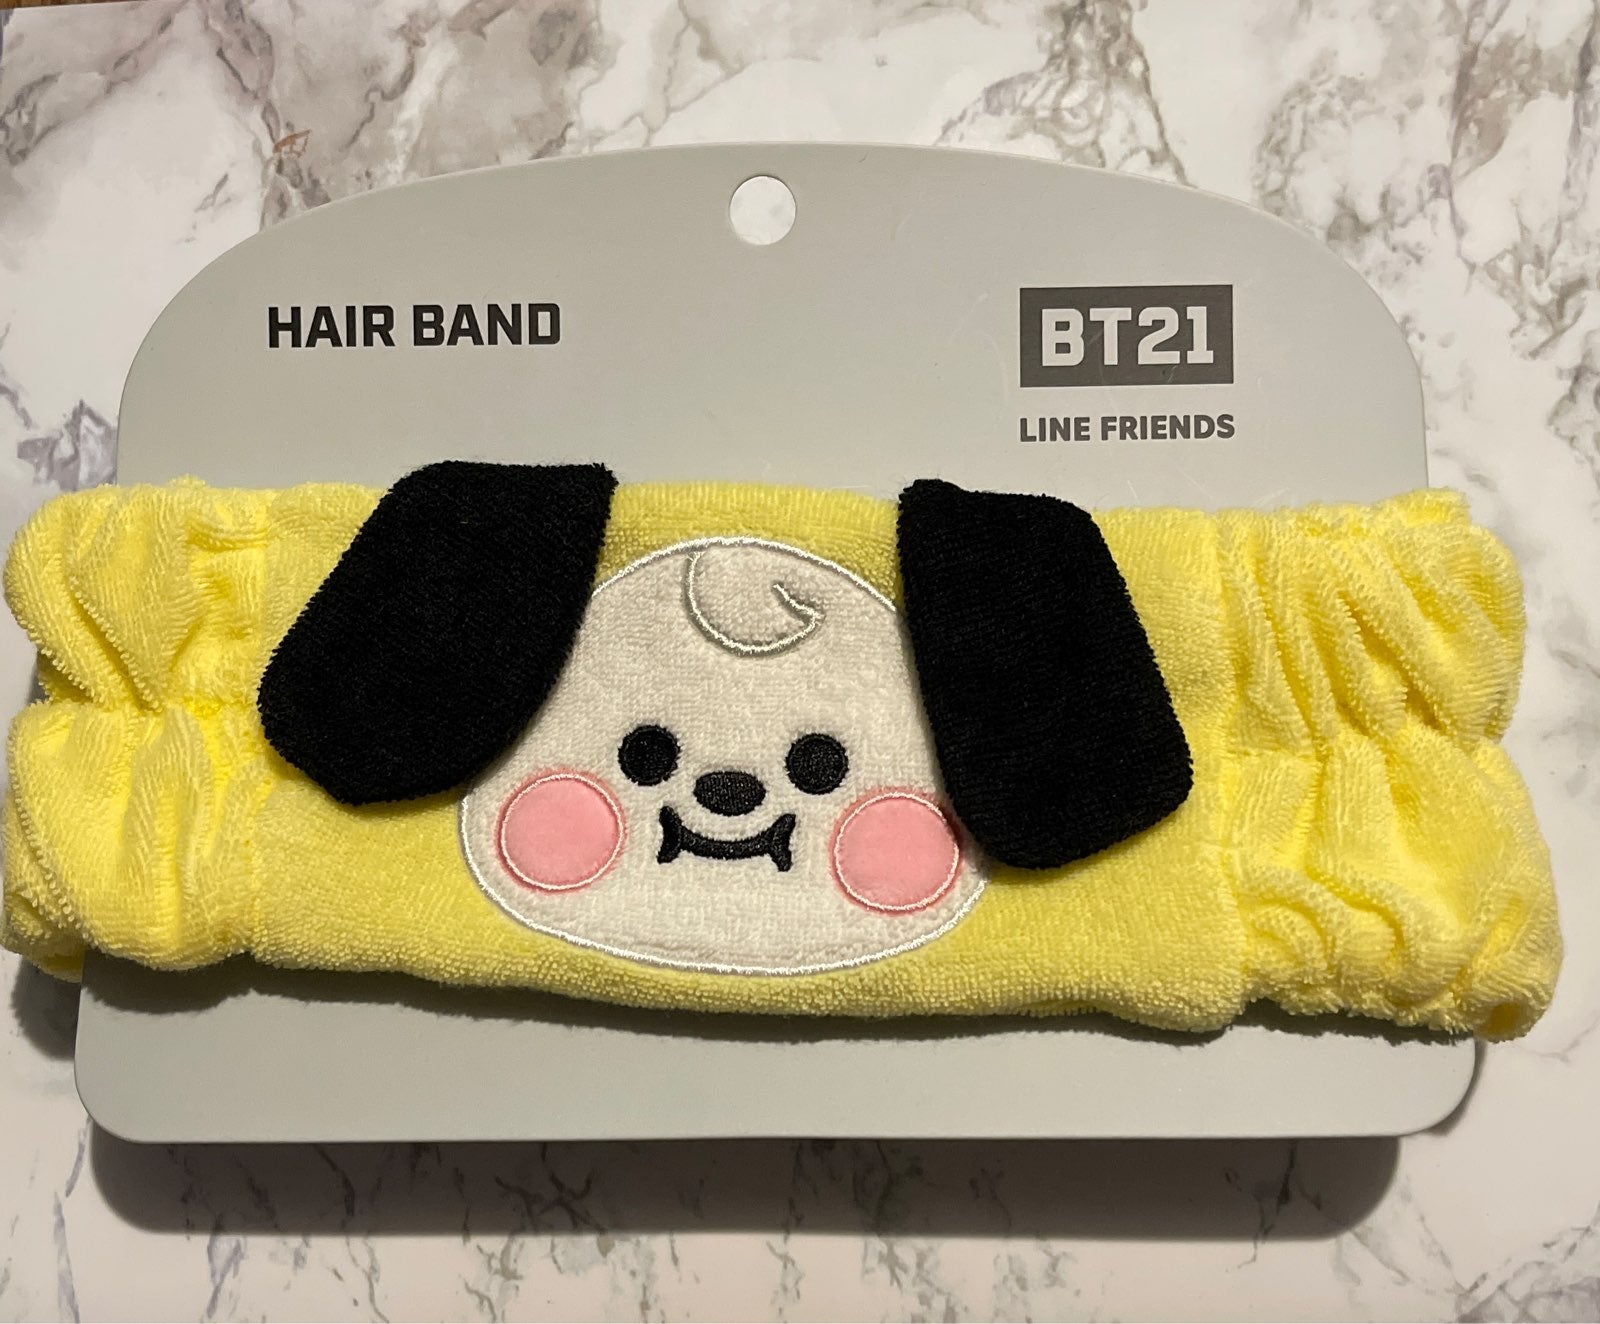 BT21 Chimmy Hair band